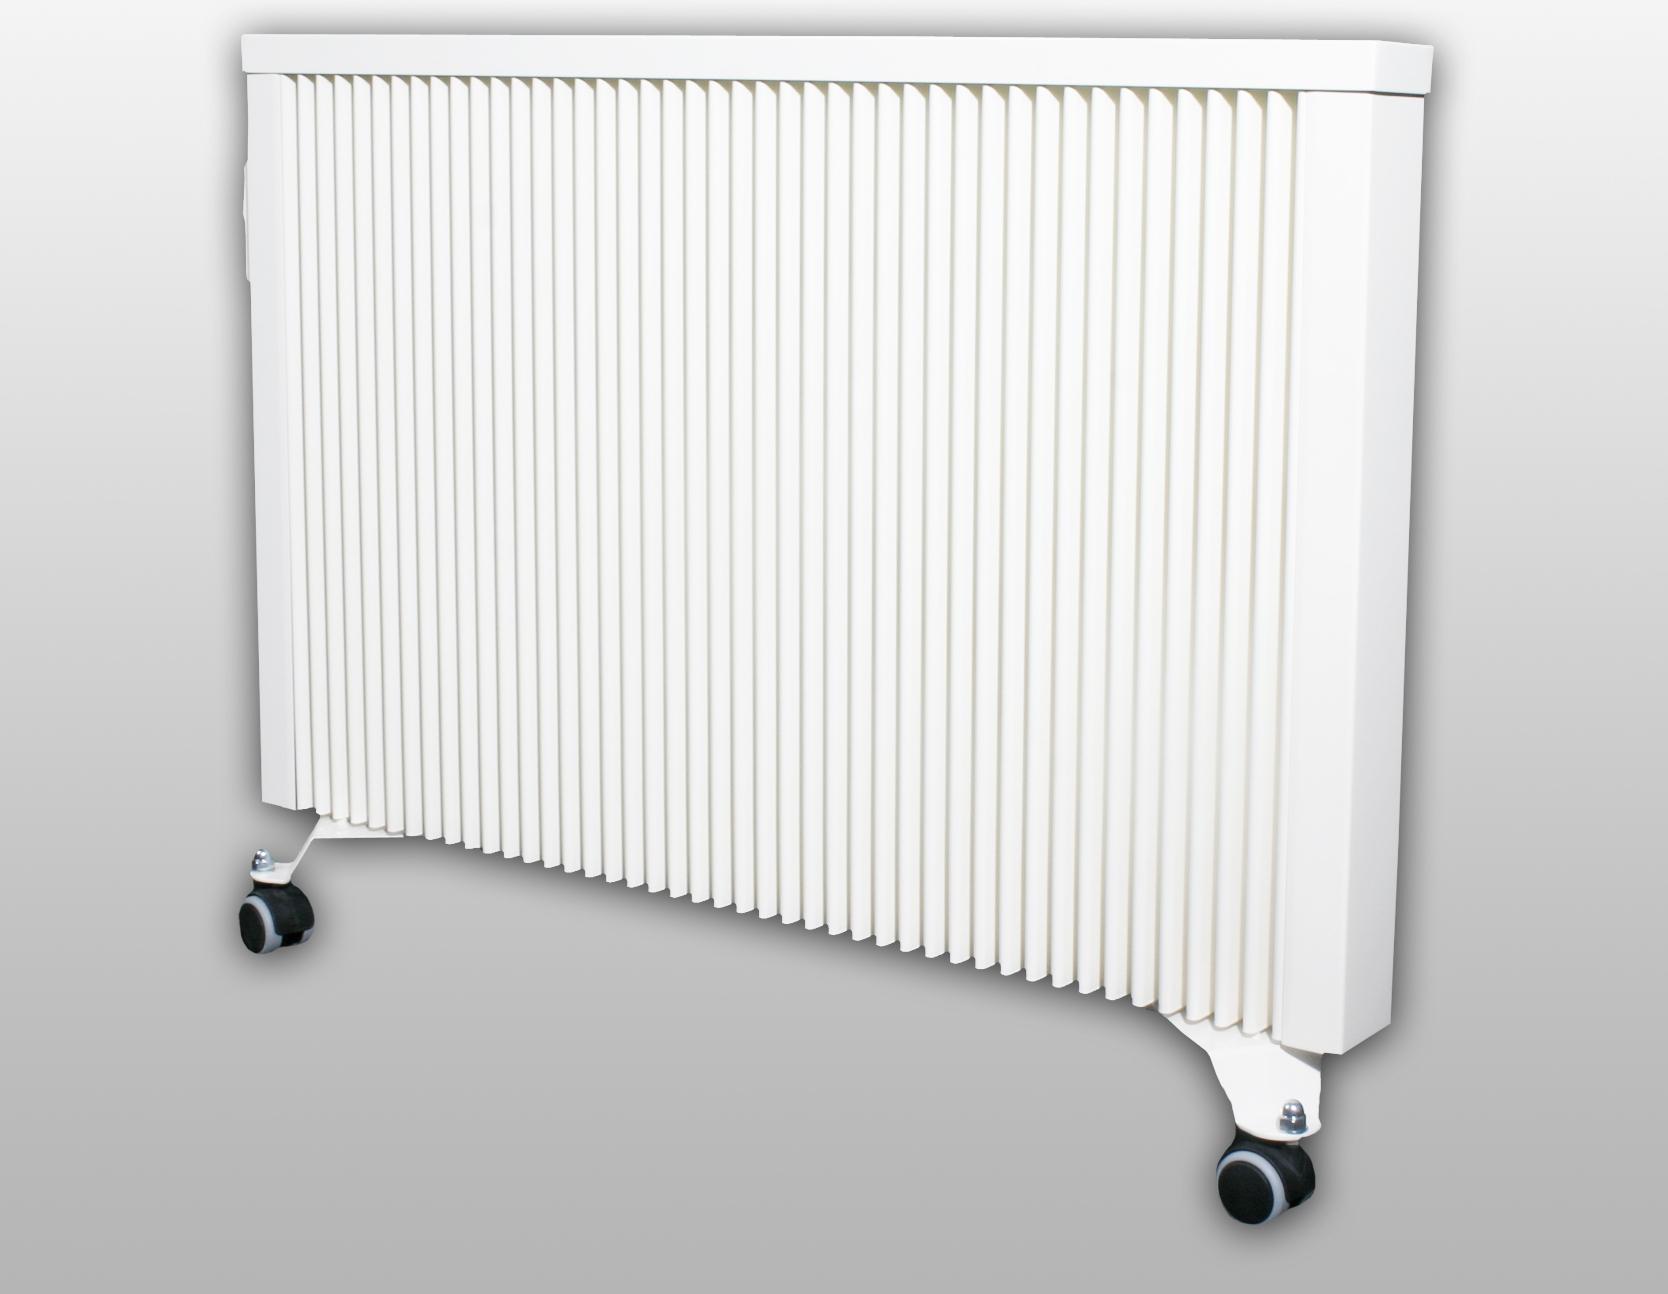 Topný panel série H, TYP H50, 500 W